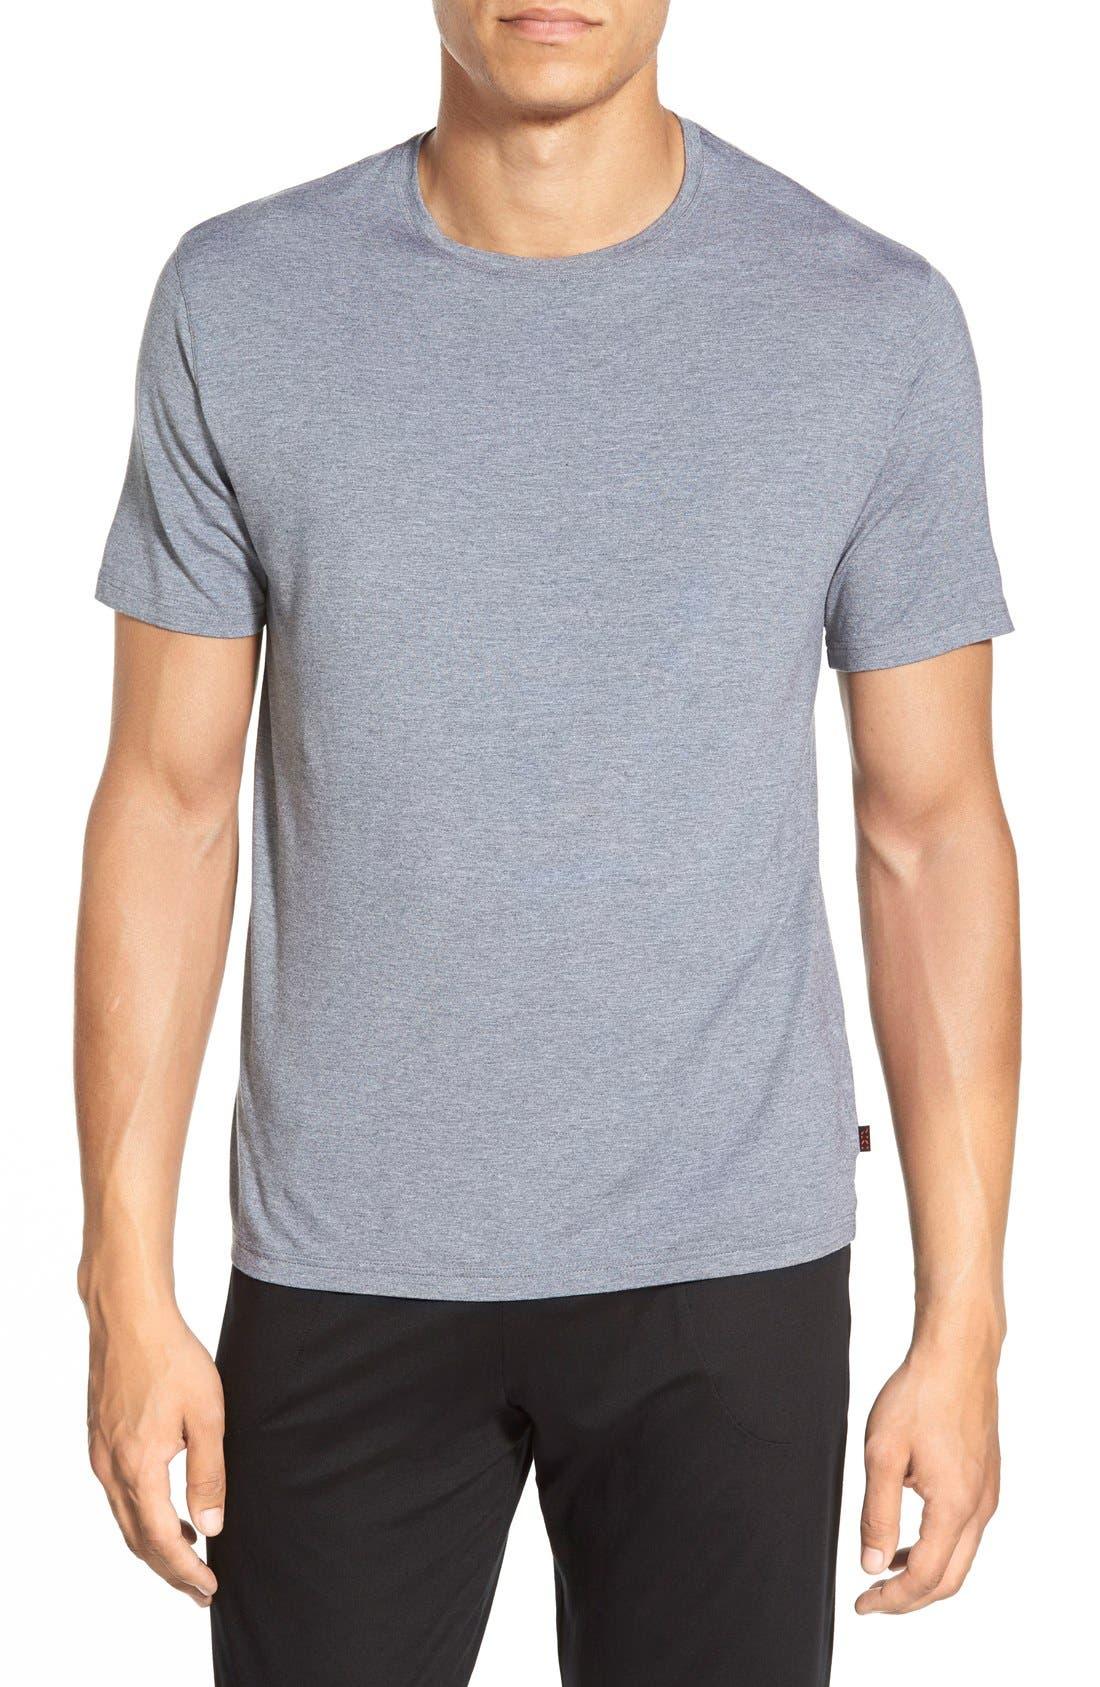 Alternate Image 1 Selected - Derek Rose 'Marlowe' Stretch Modal T-Shirt